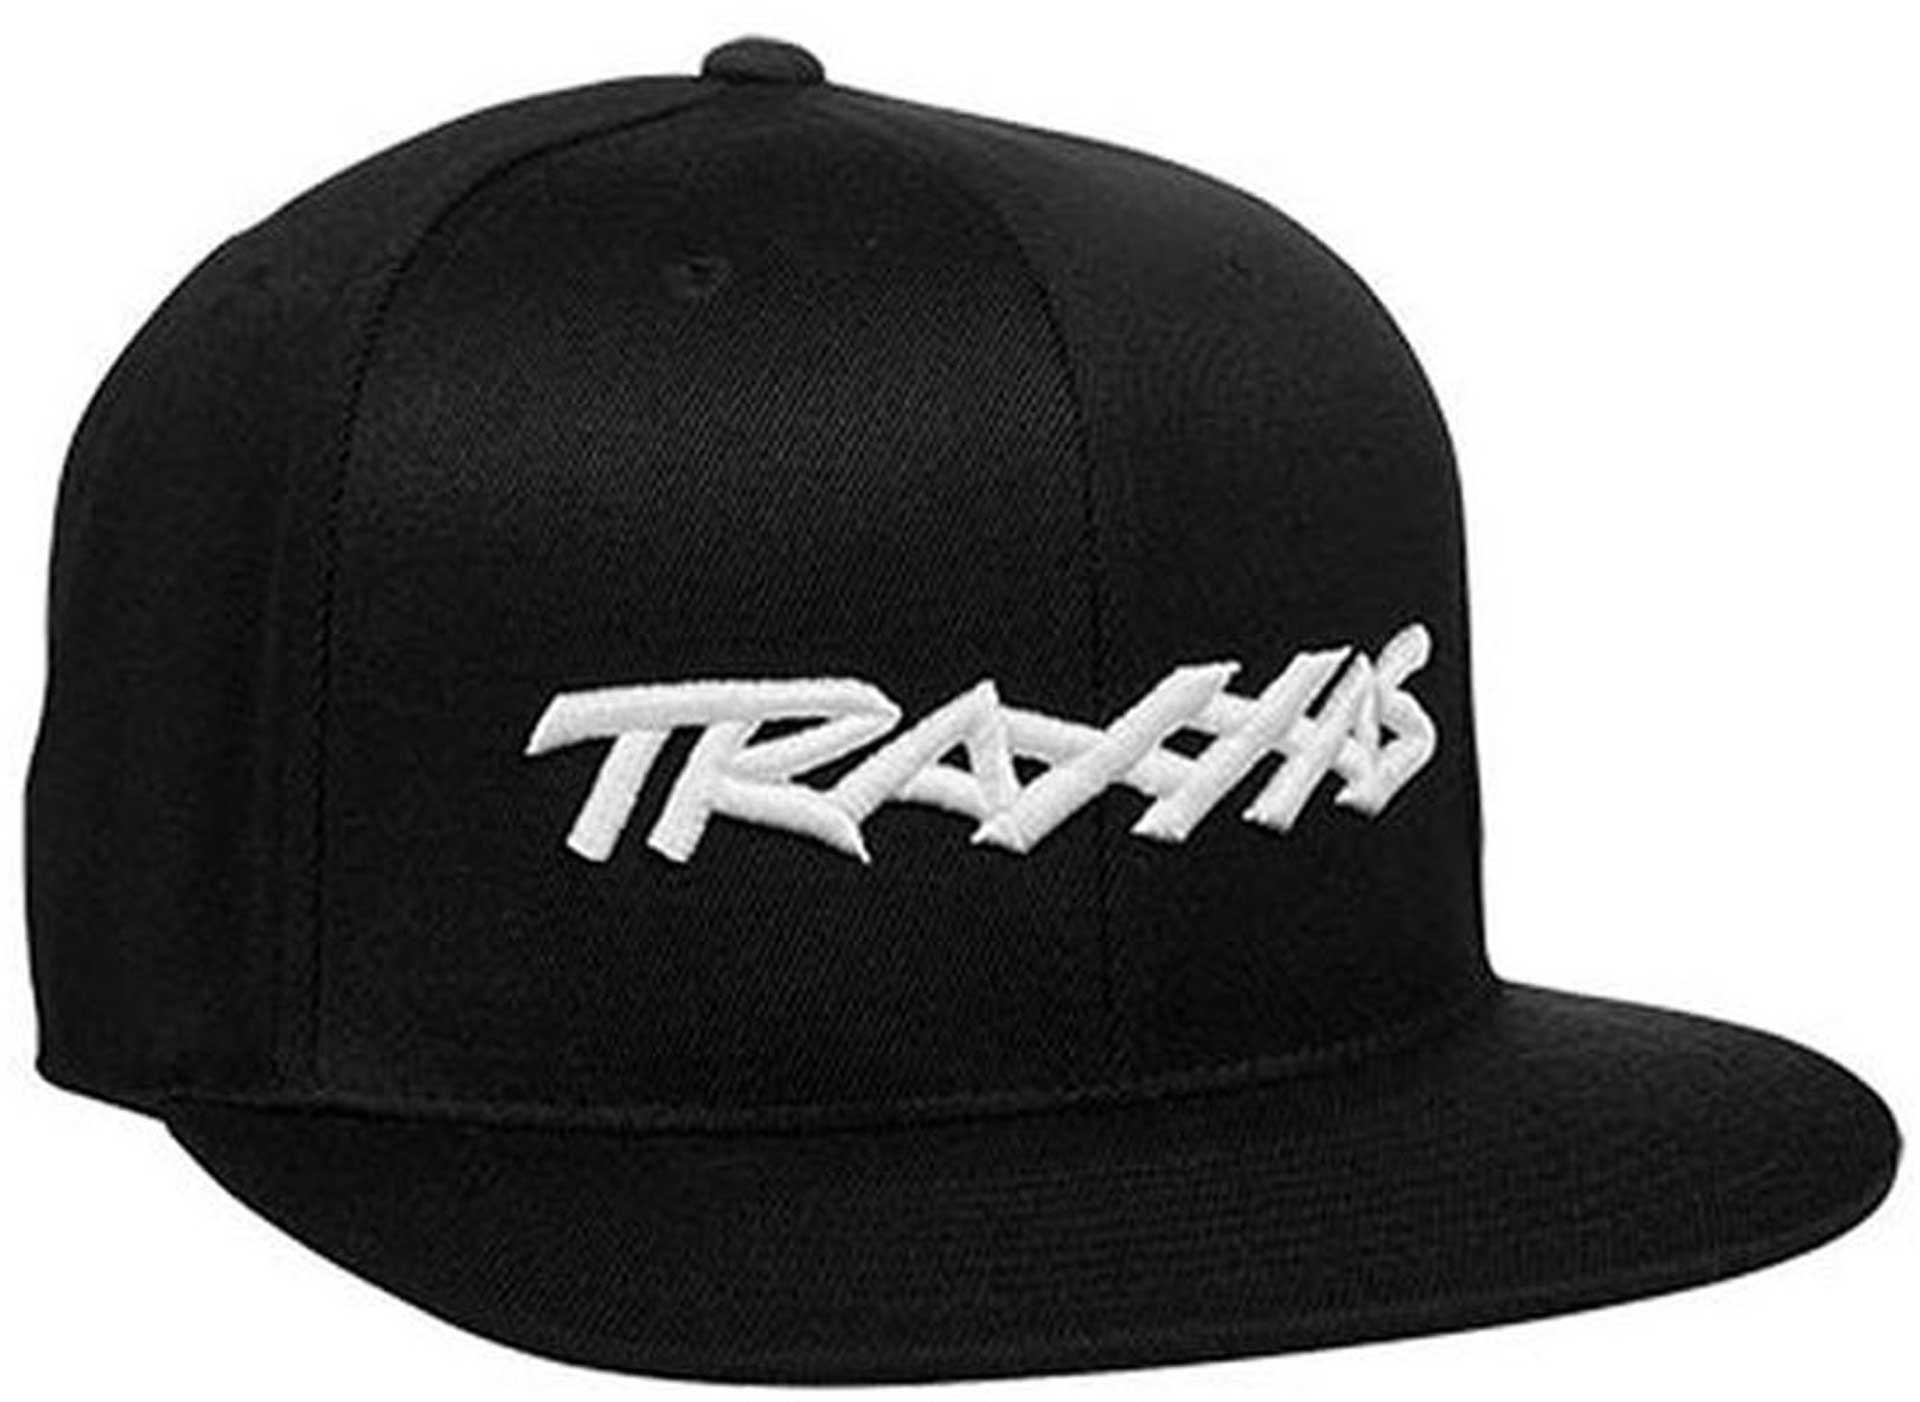 TRAXXAS SNAP HAS FLAT BILL BLACK